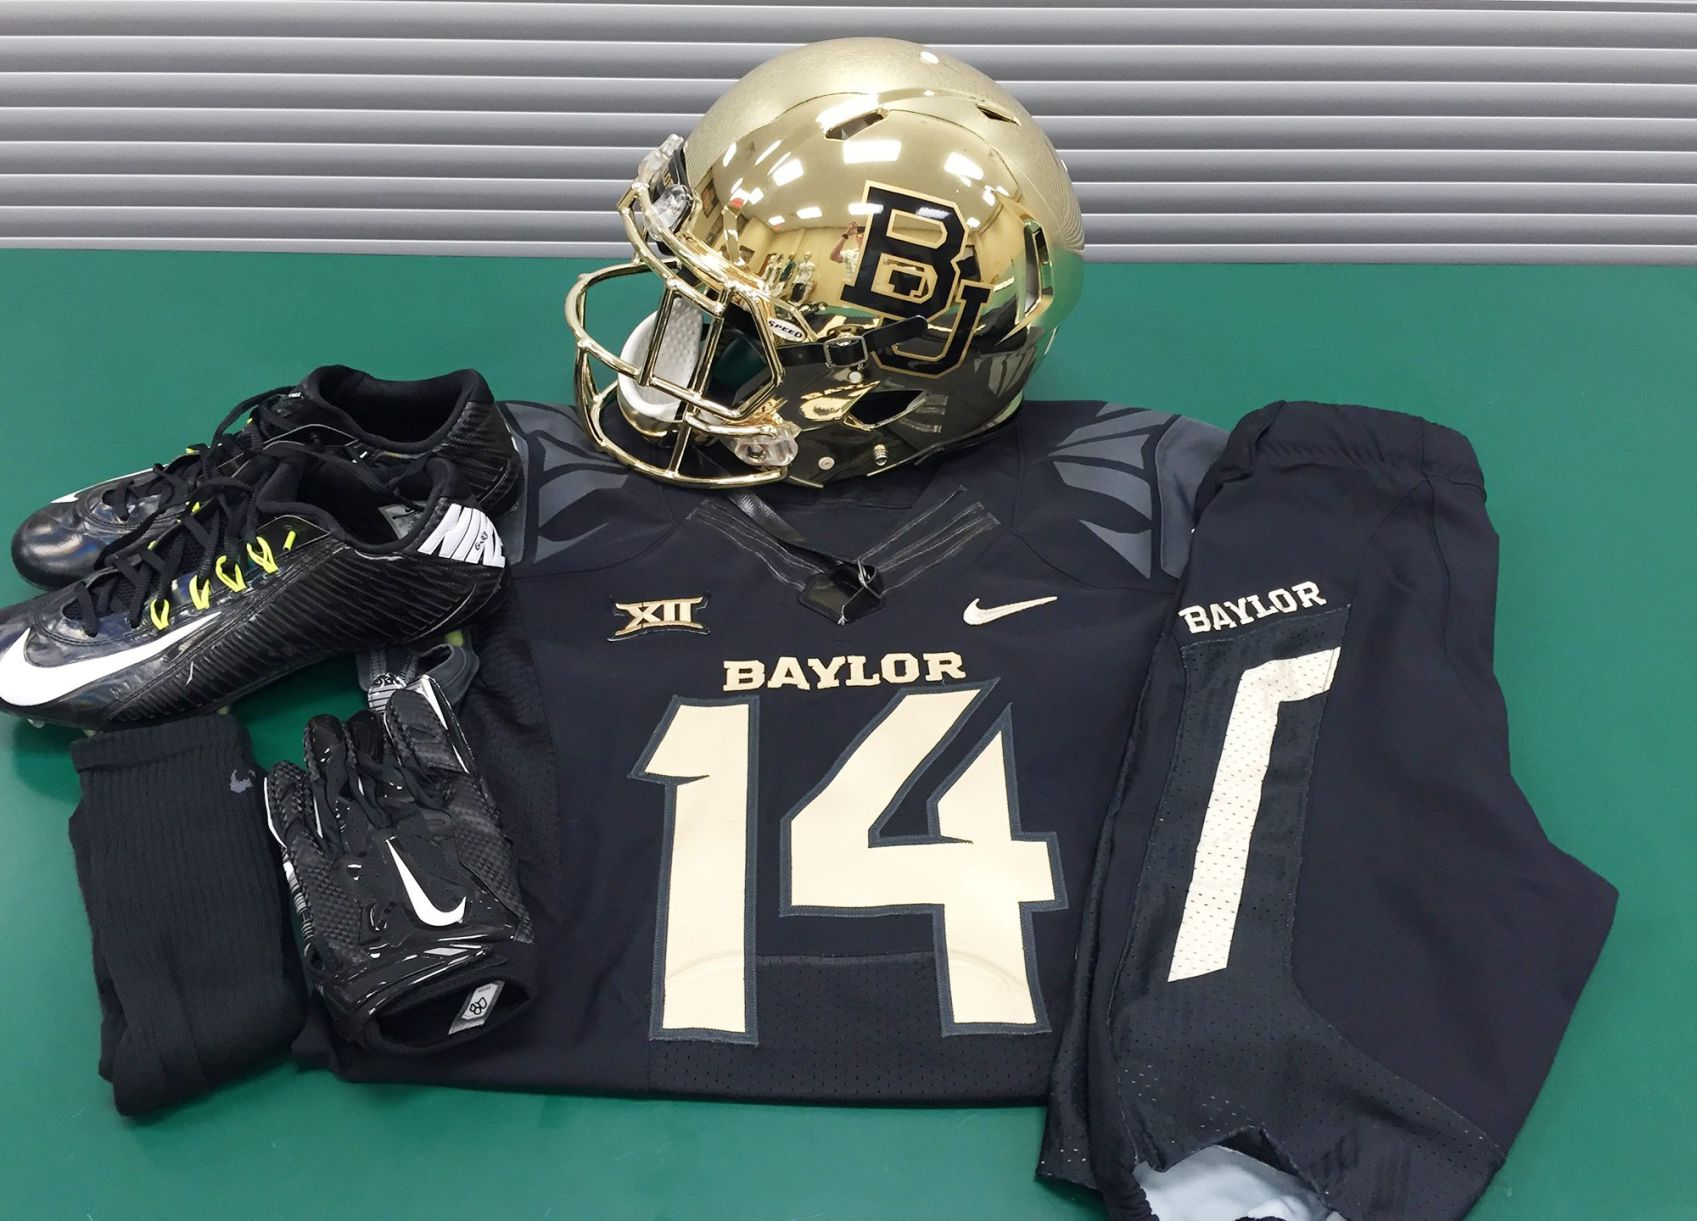 Baylor s endless variety of uniforms has given football program an ... 97310b76b